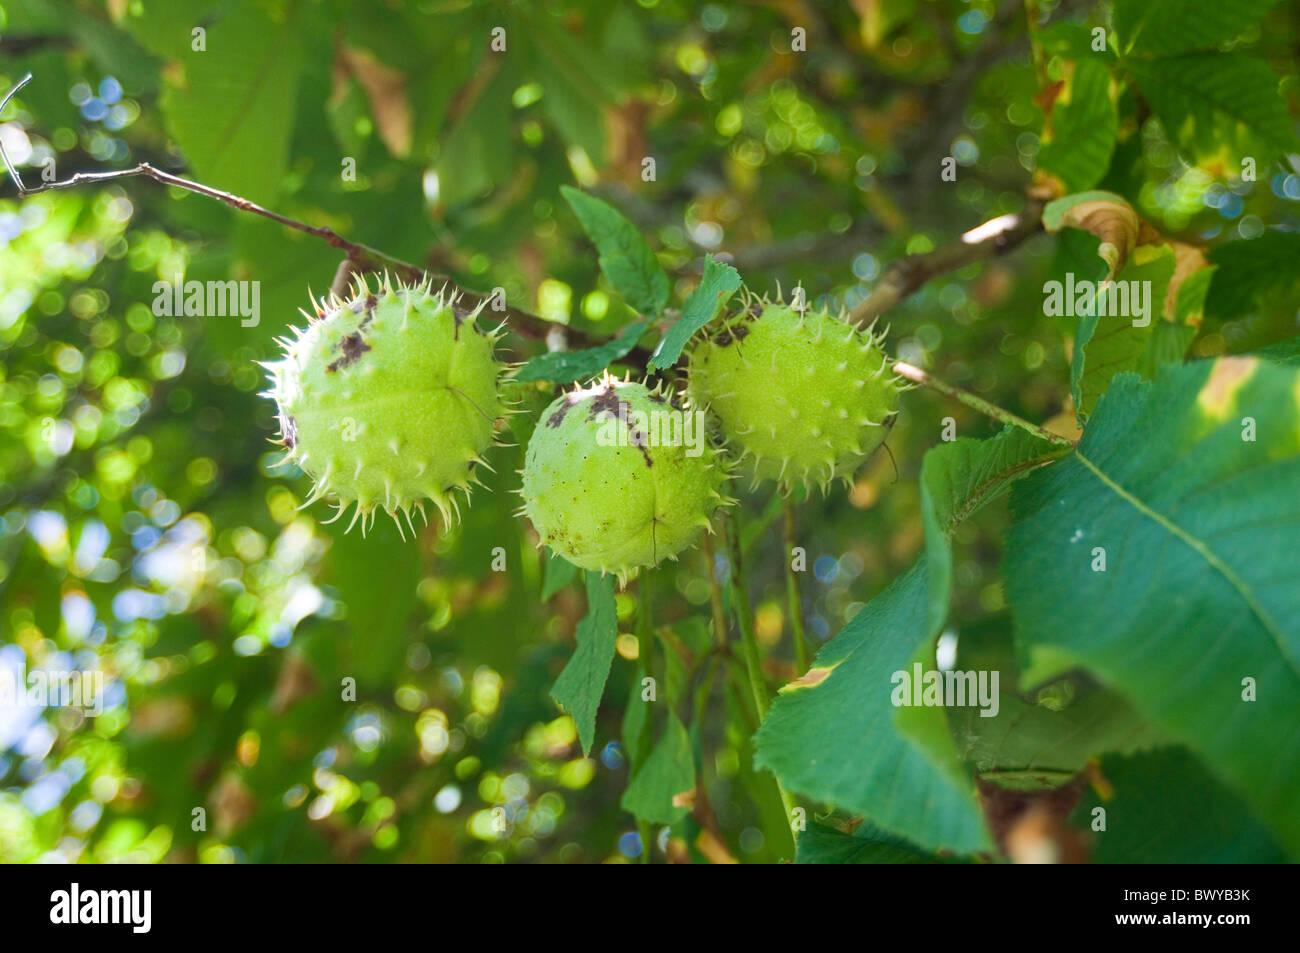 horsechestnut horsechestnuts horse chest nut nuts chestnut chestnuts tree trees conker conkers - Stock Image